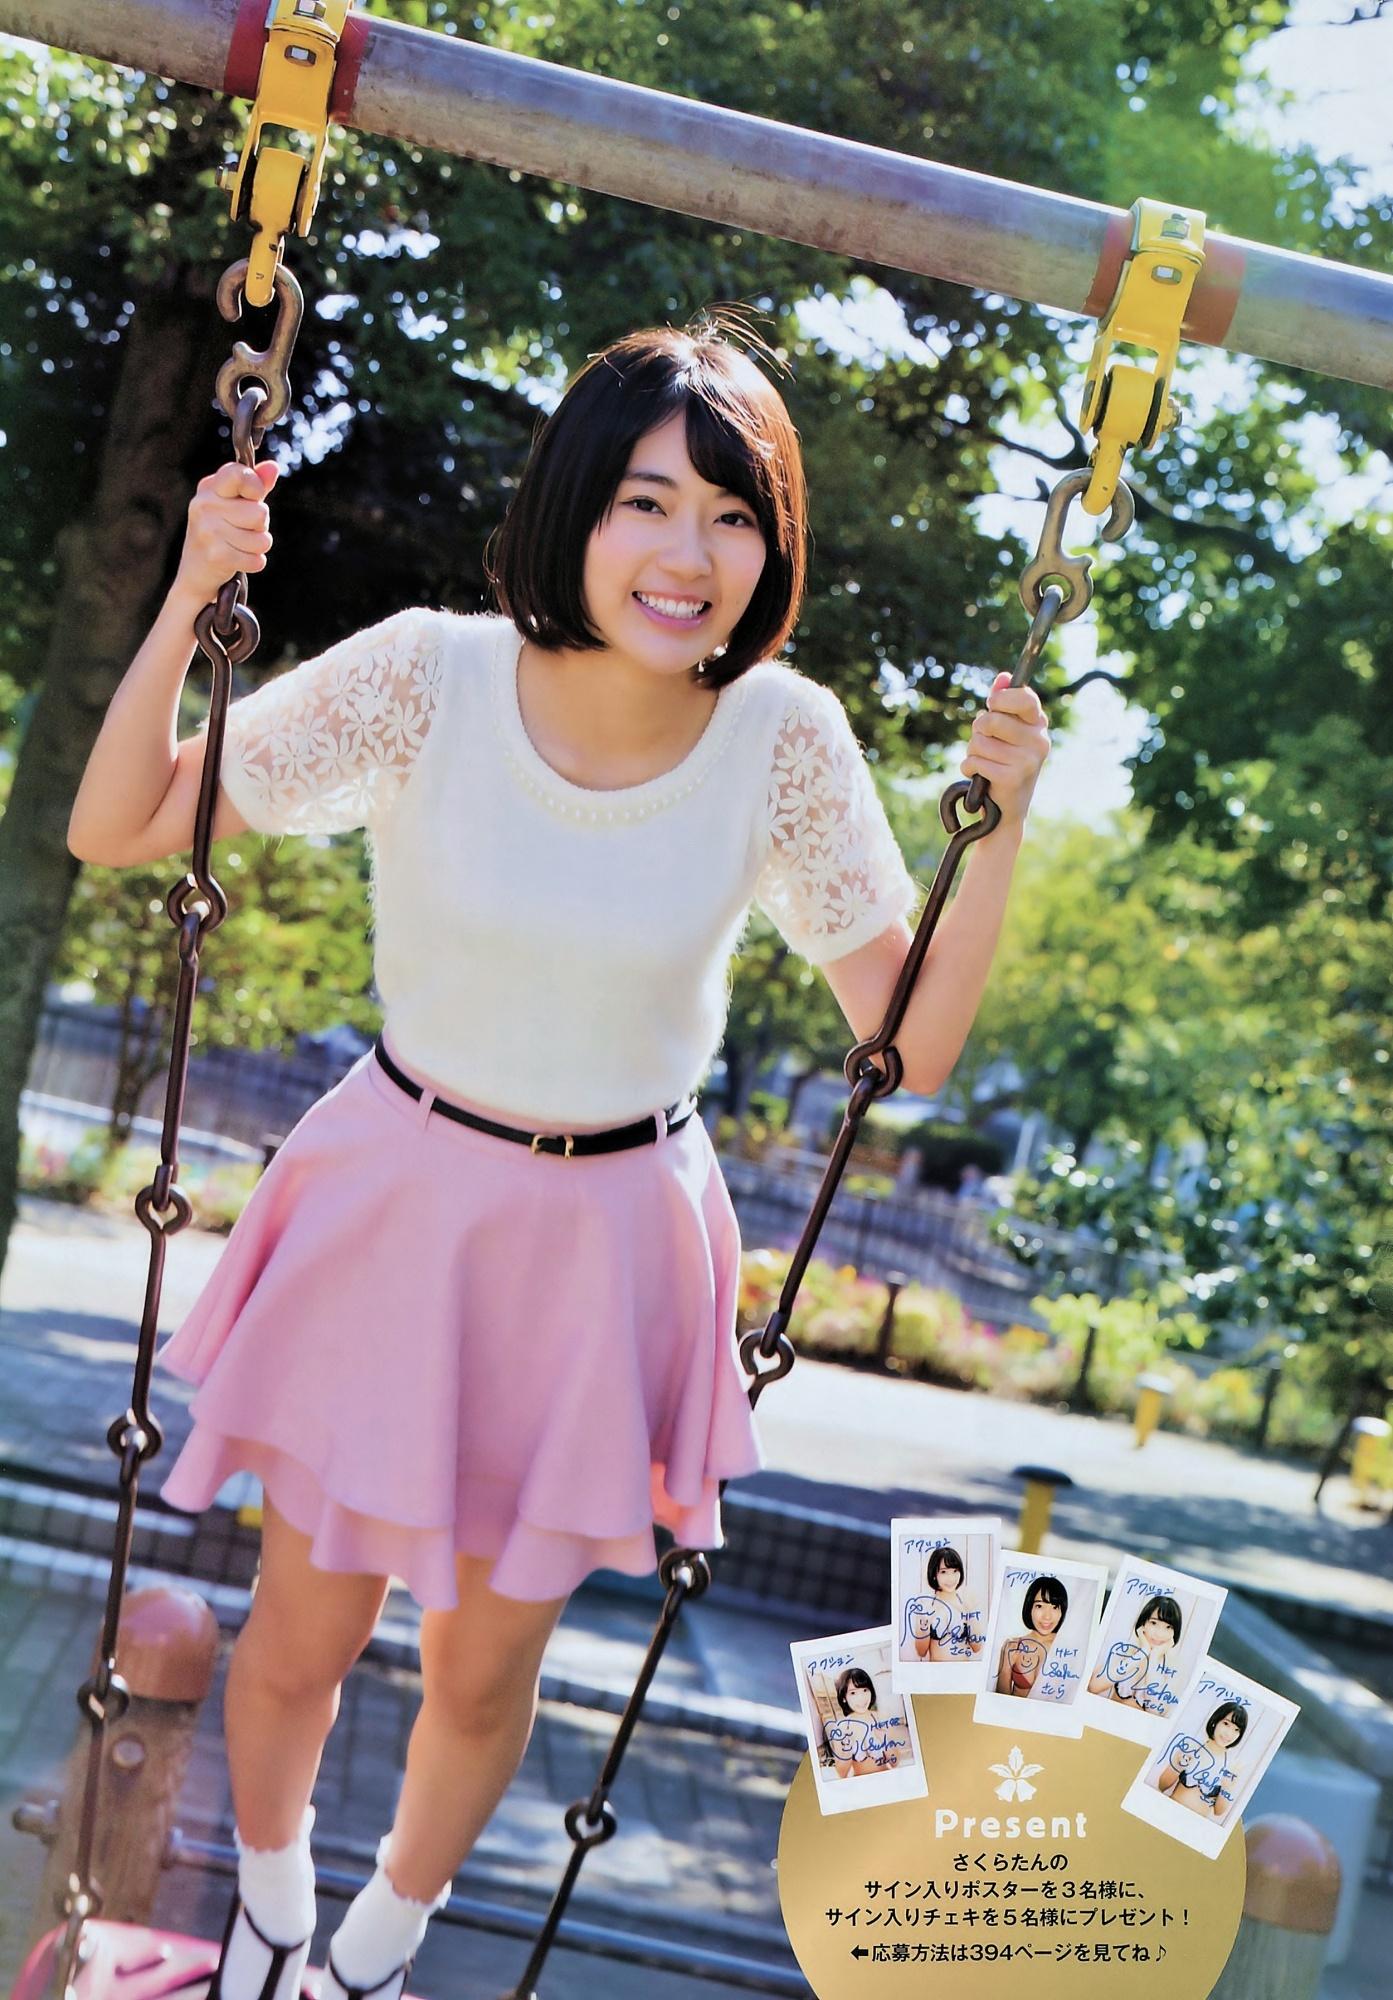 Miyawaki Sakura Android Iphone Wallpaper 1553 Asiachan Kpop Image